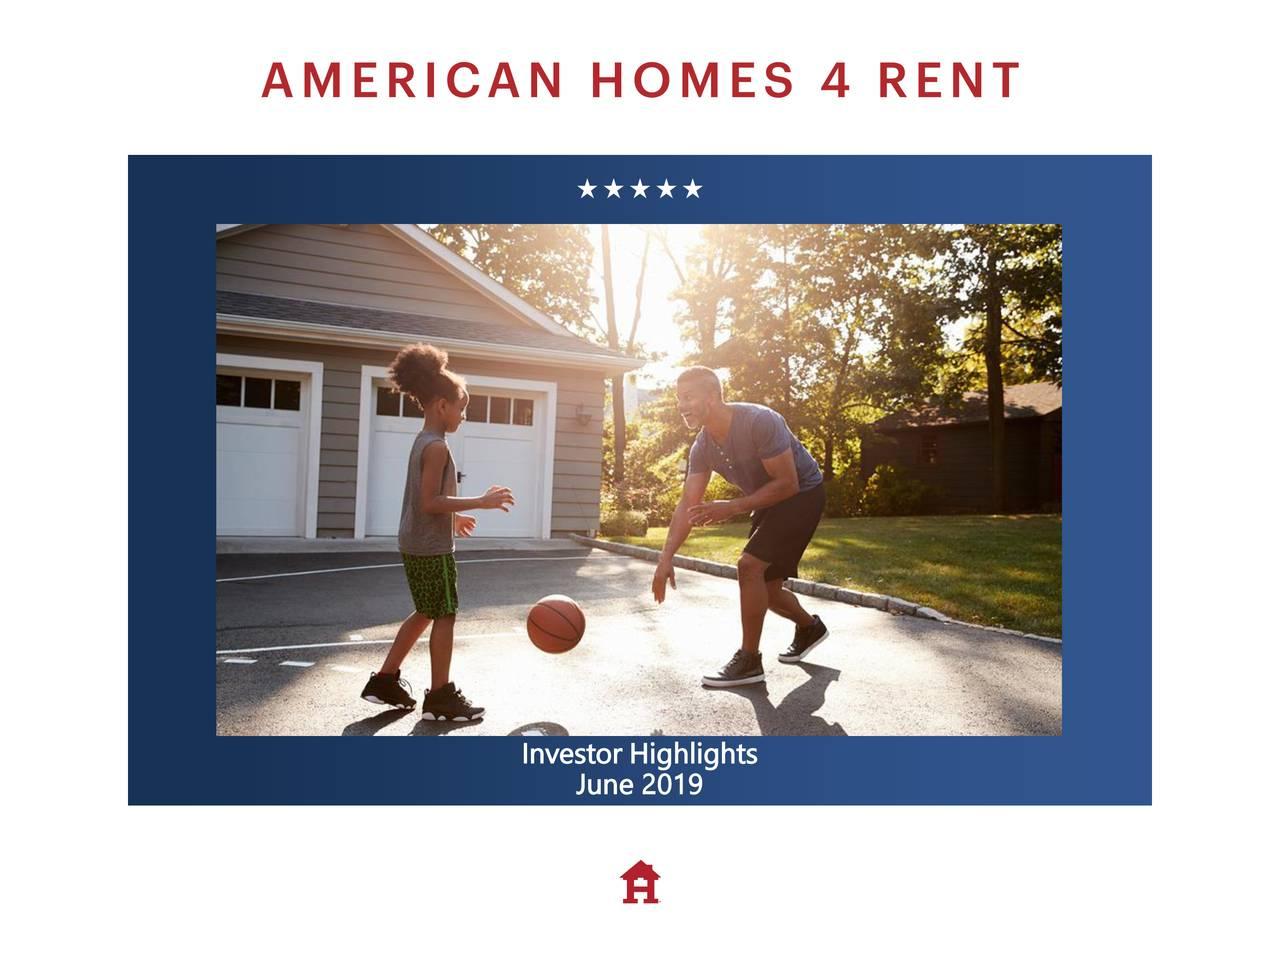 American Homes 4 Rent (AMH) Investor Presentation - Slideshow